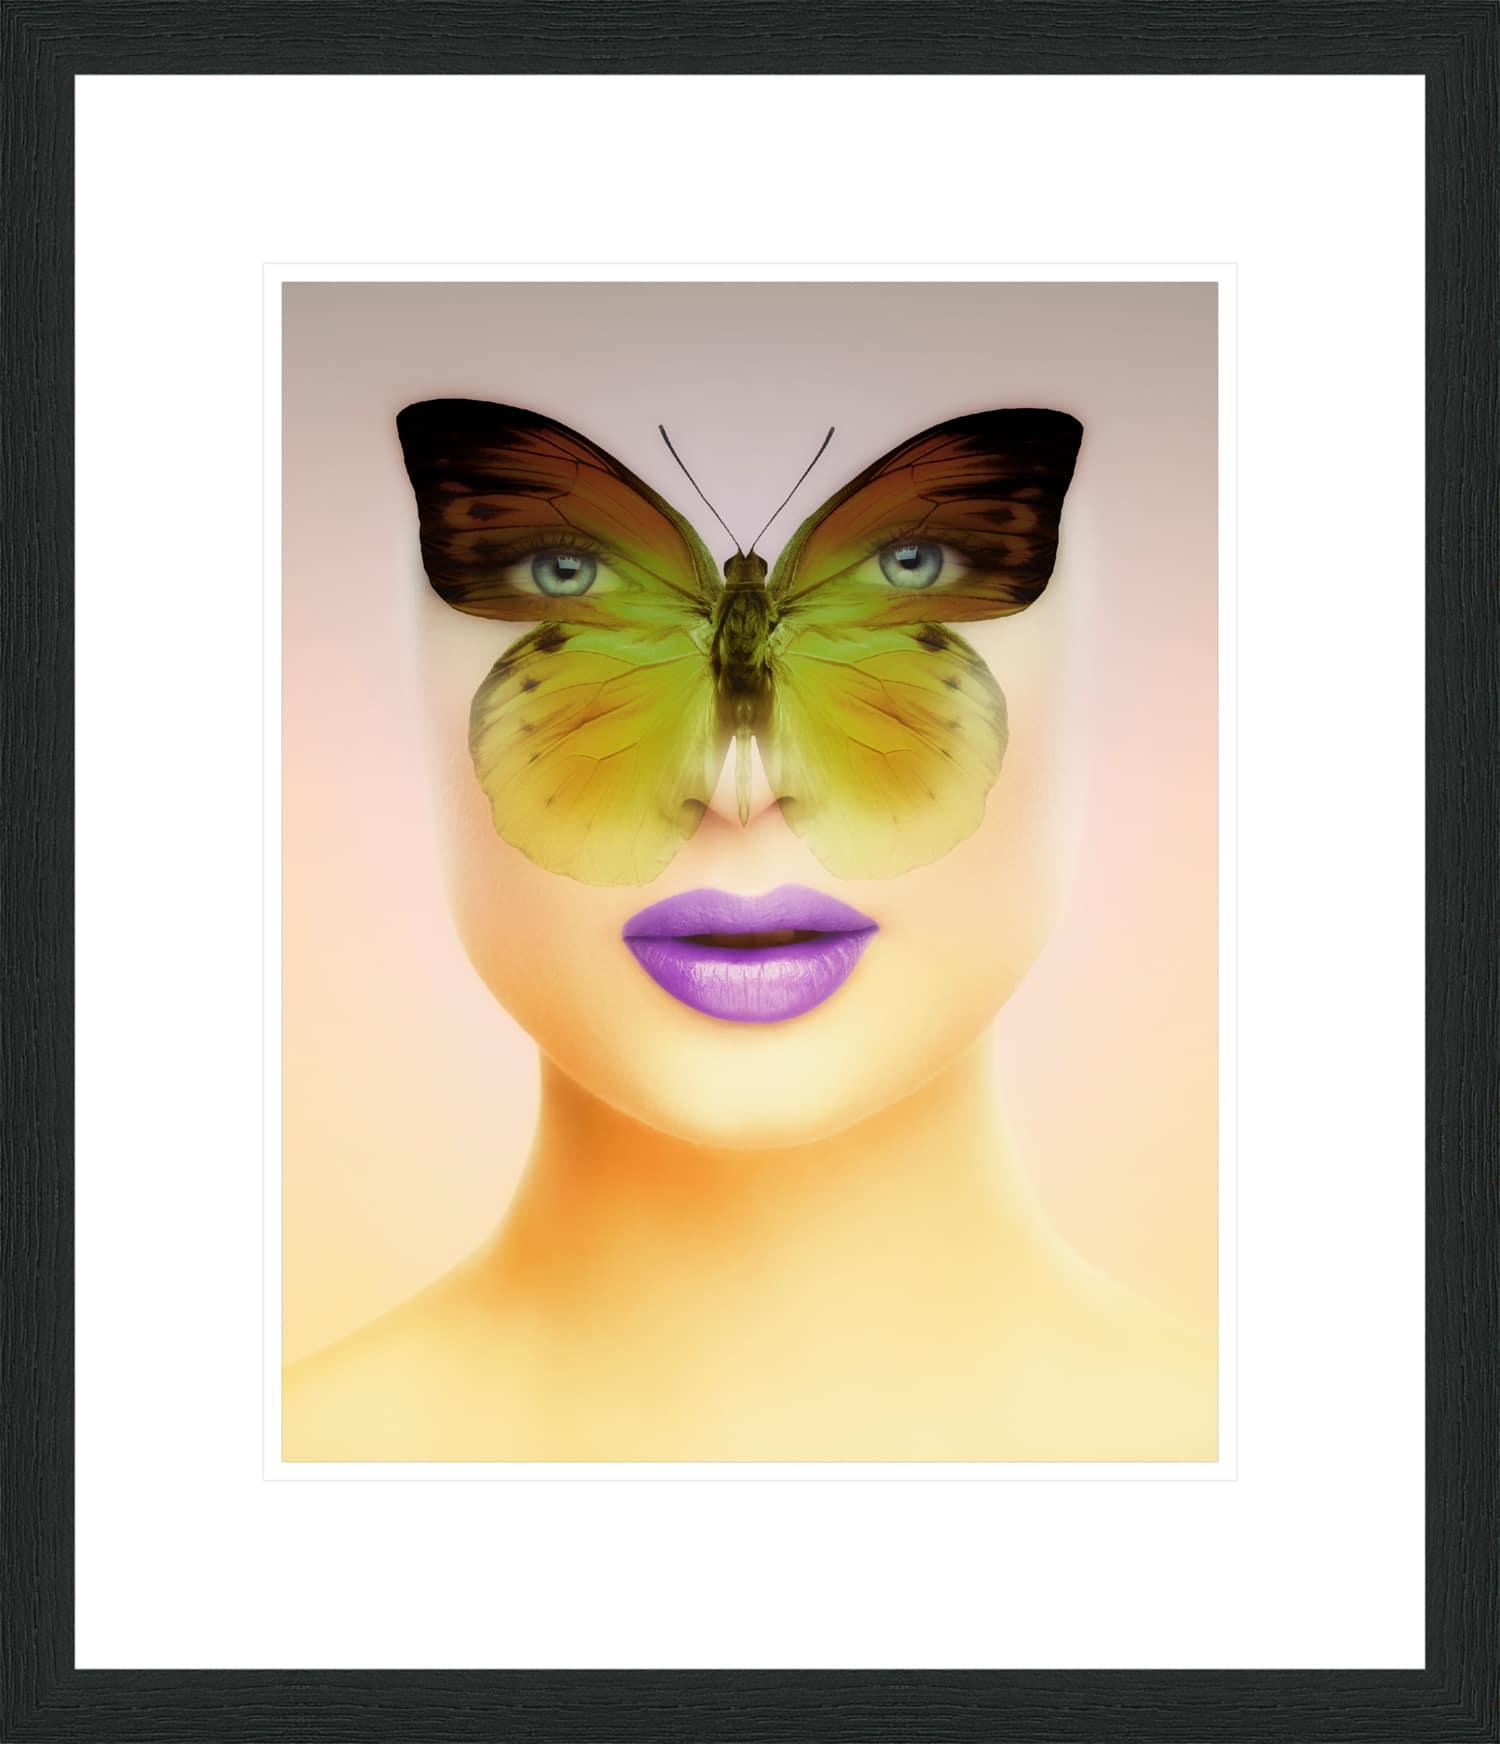 Metamorphosis 2 - Erik Brede Photography